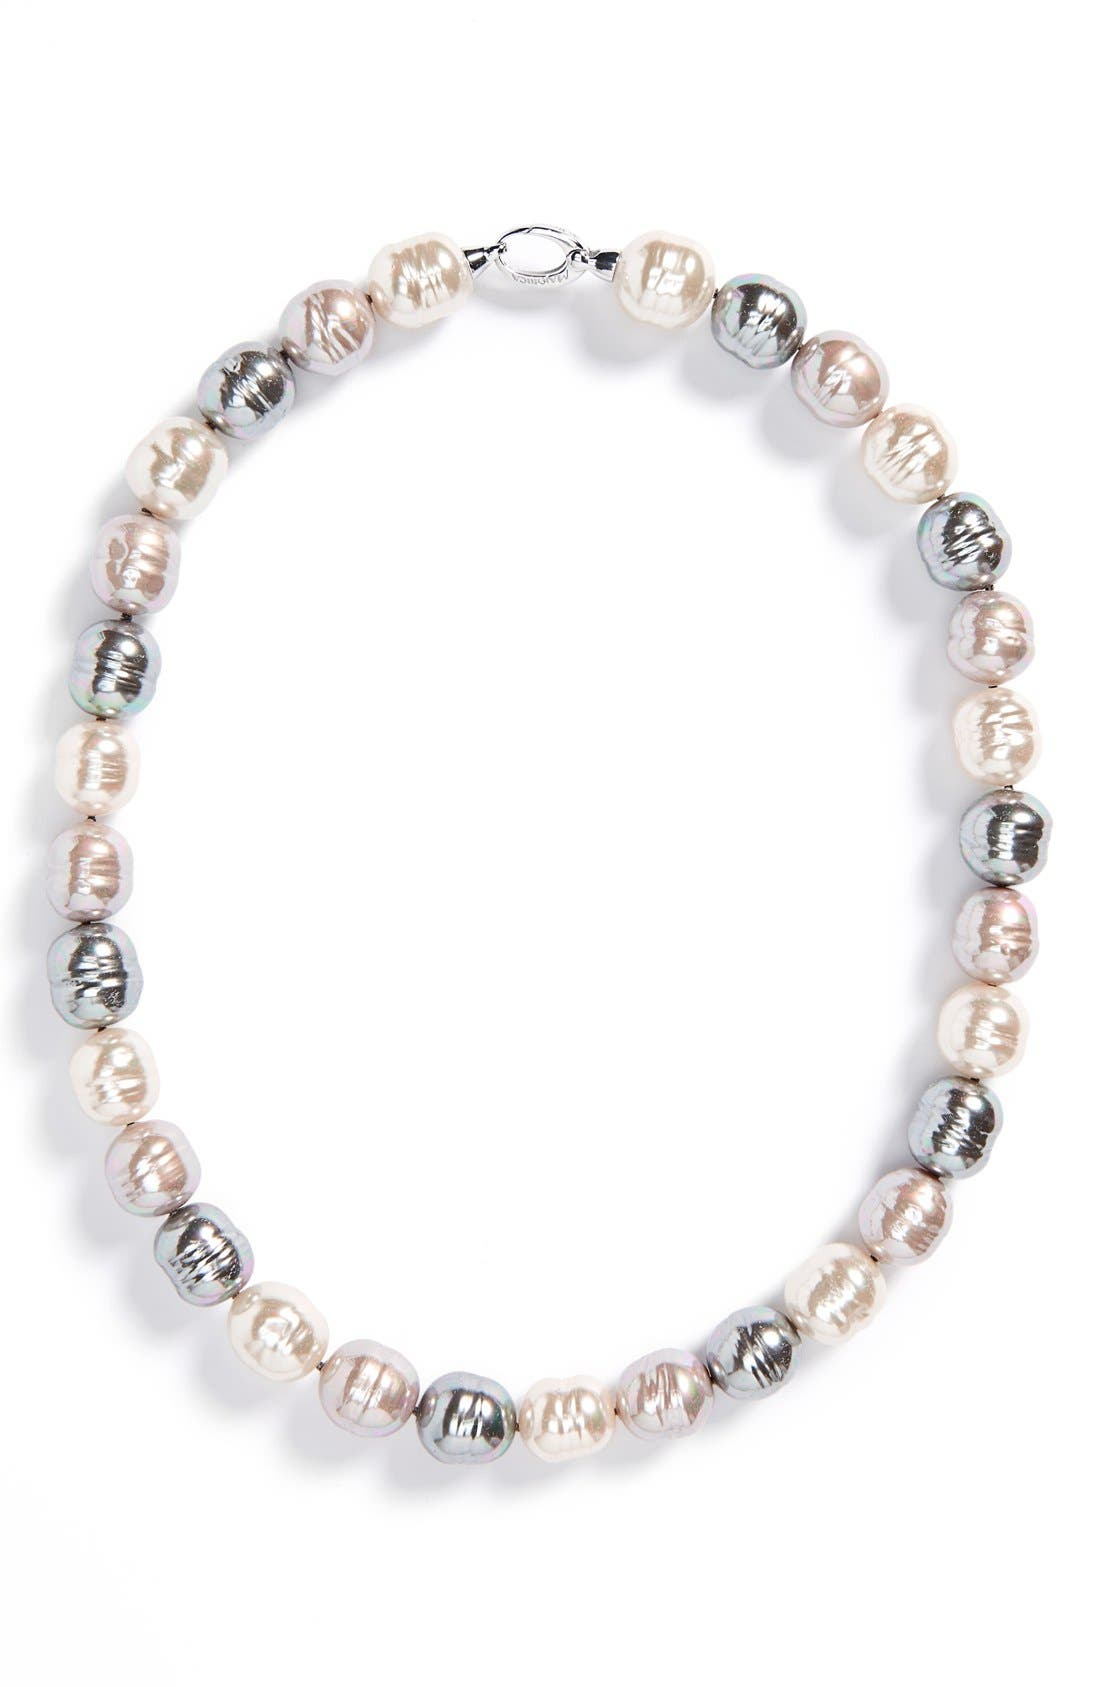 Main Image - Majorica 14mm Baroque Pearl Necklace